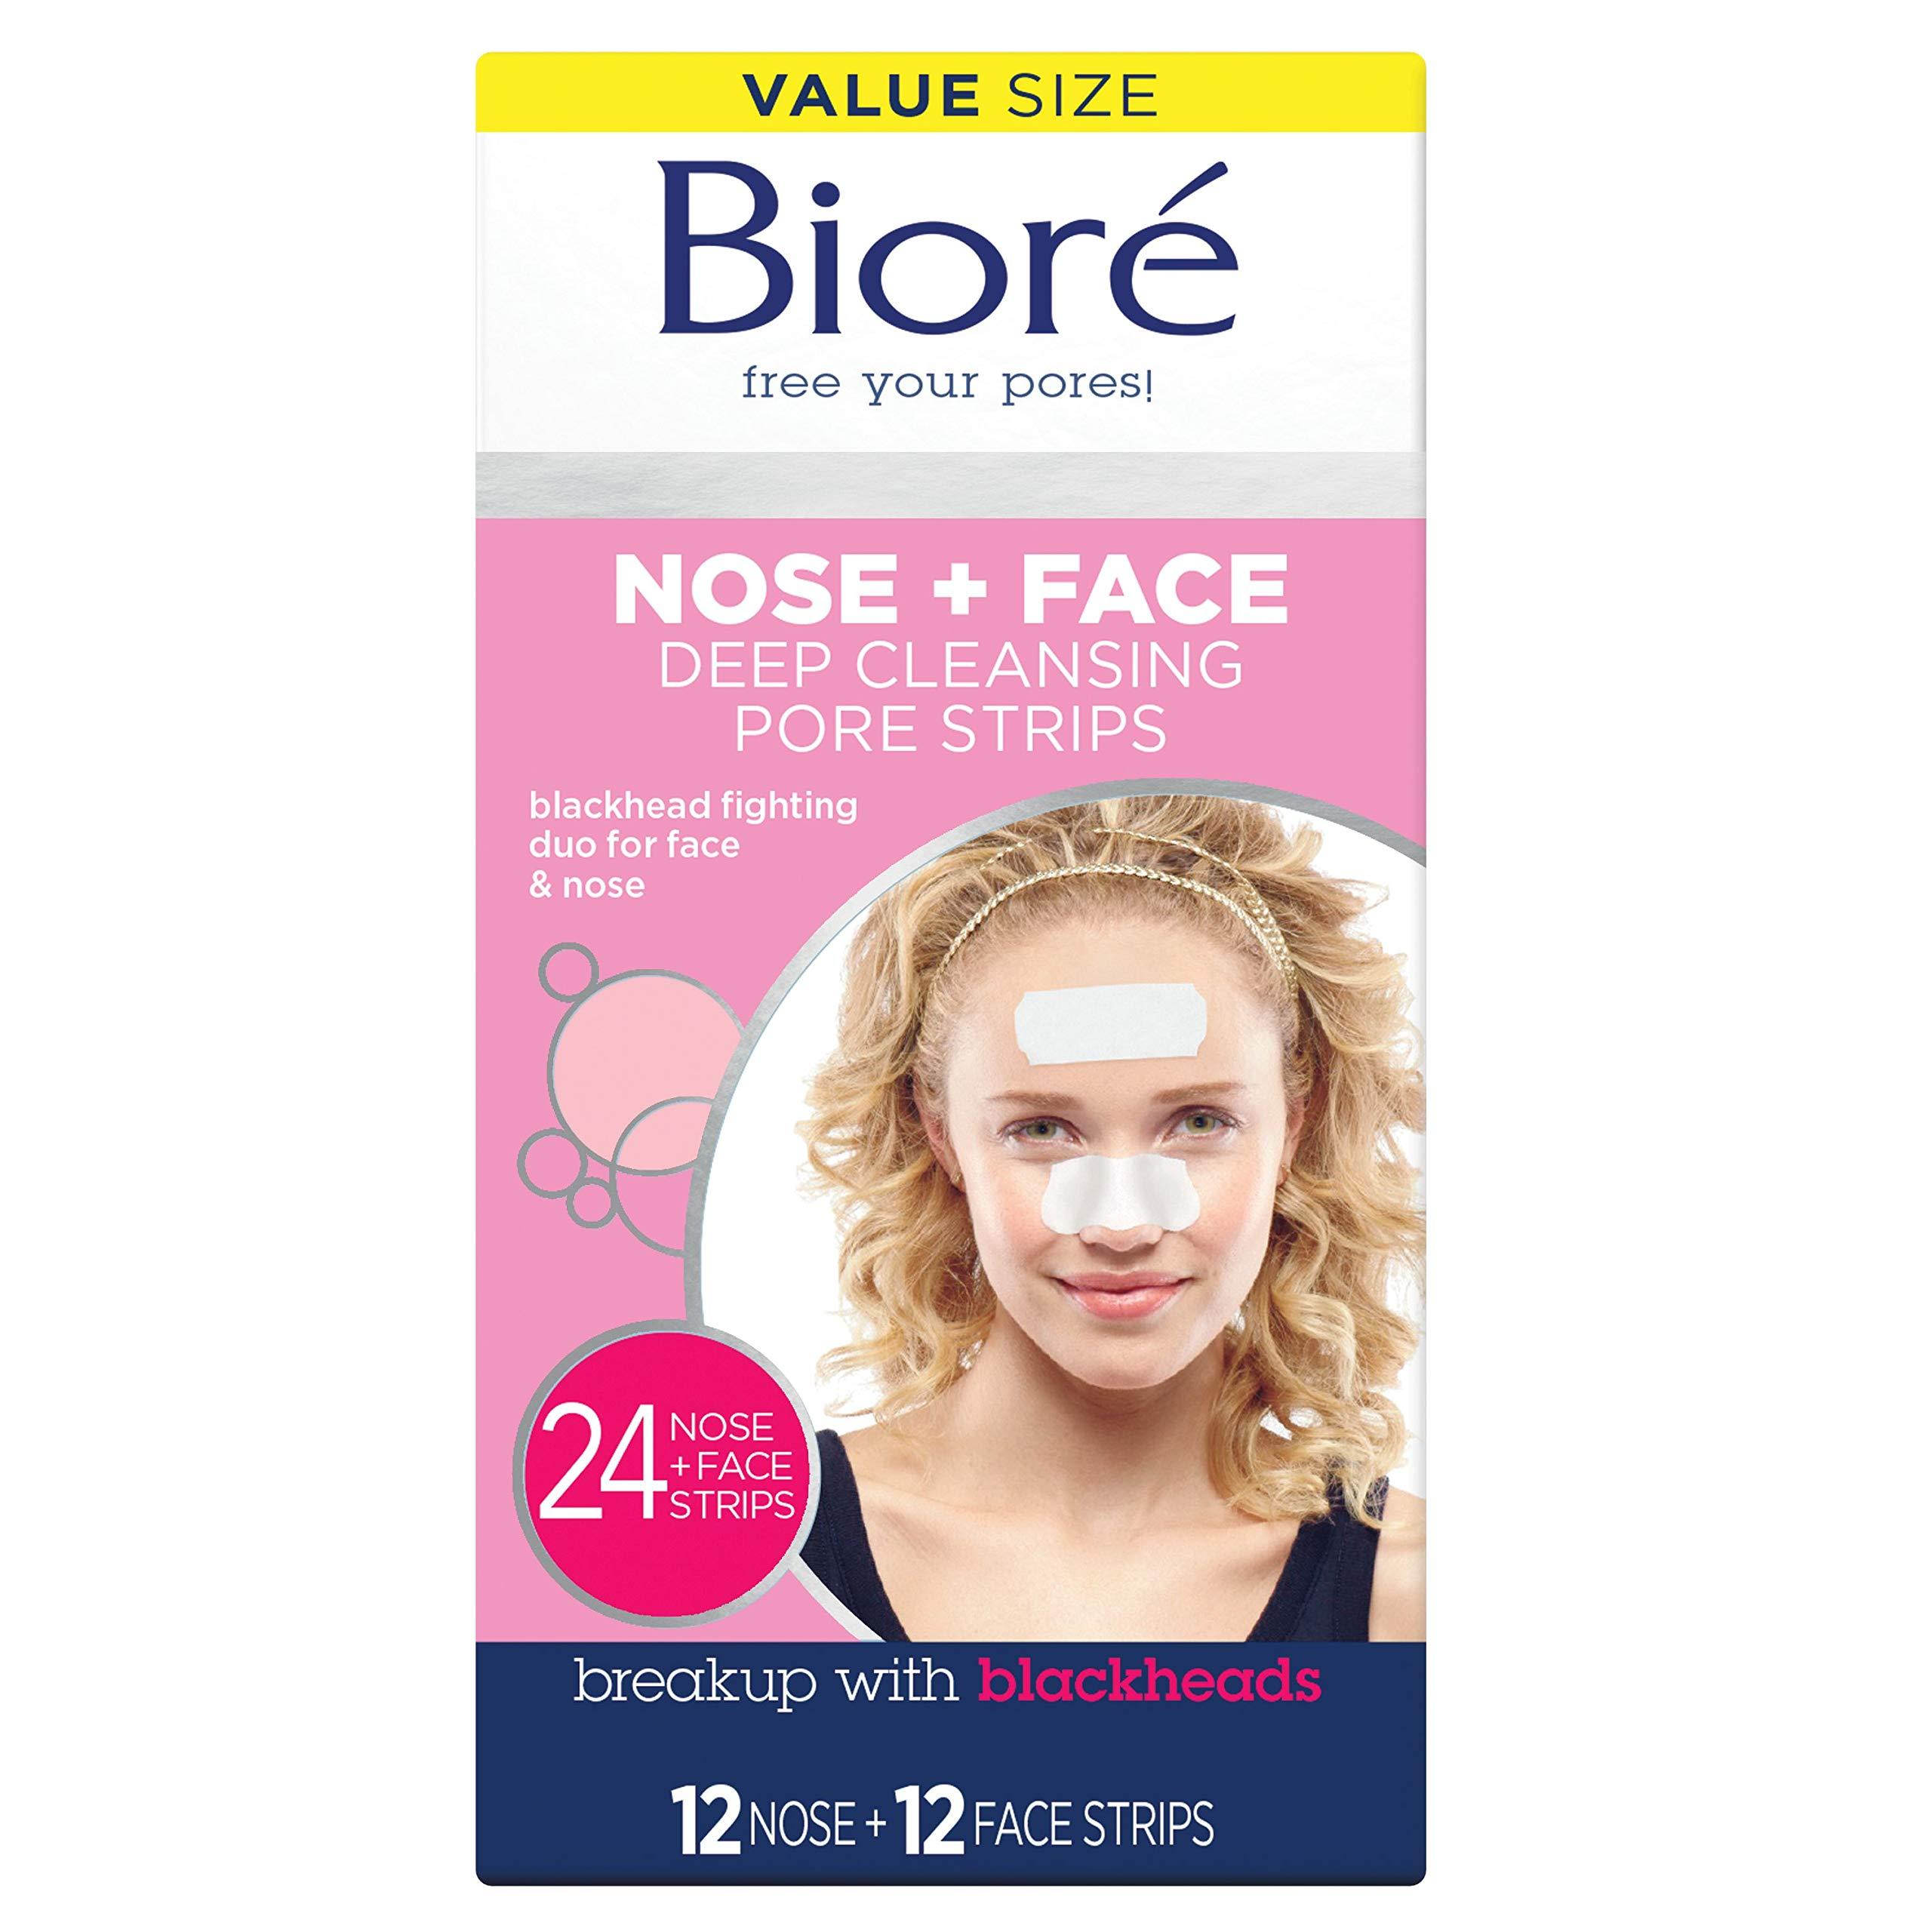 Bioré Blackhead Removing and Pore Unclogging Deep Cleansing Pore Strip, 24 Count by Bioré